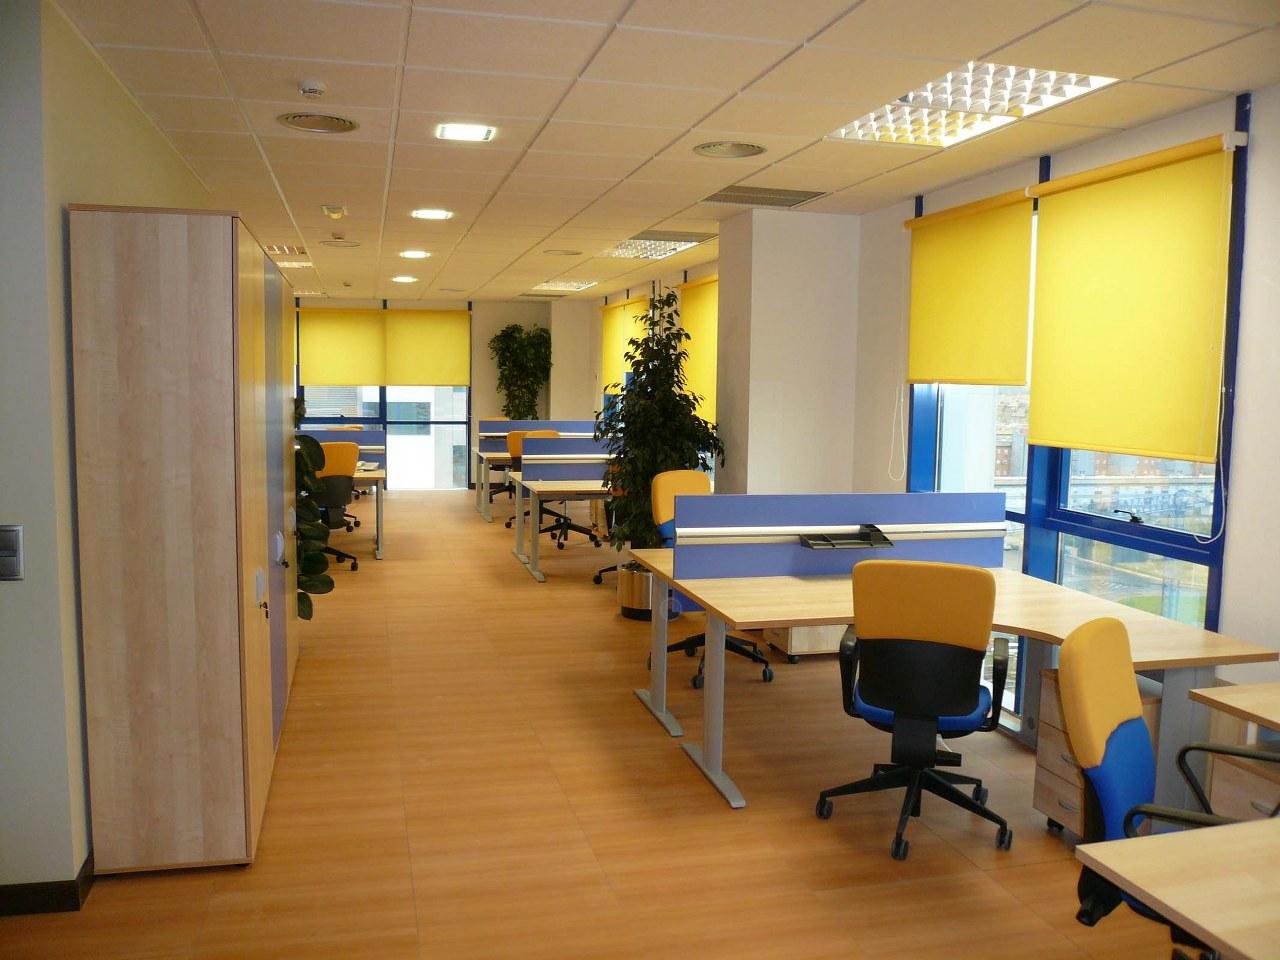 Sevilla oficinas proleit ac2bcn estudio de - Estudios de arquitectura en sevilla ...